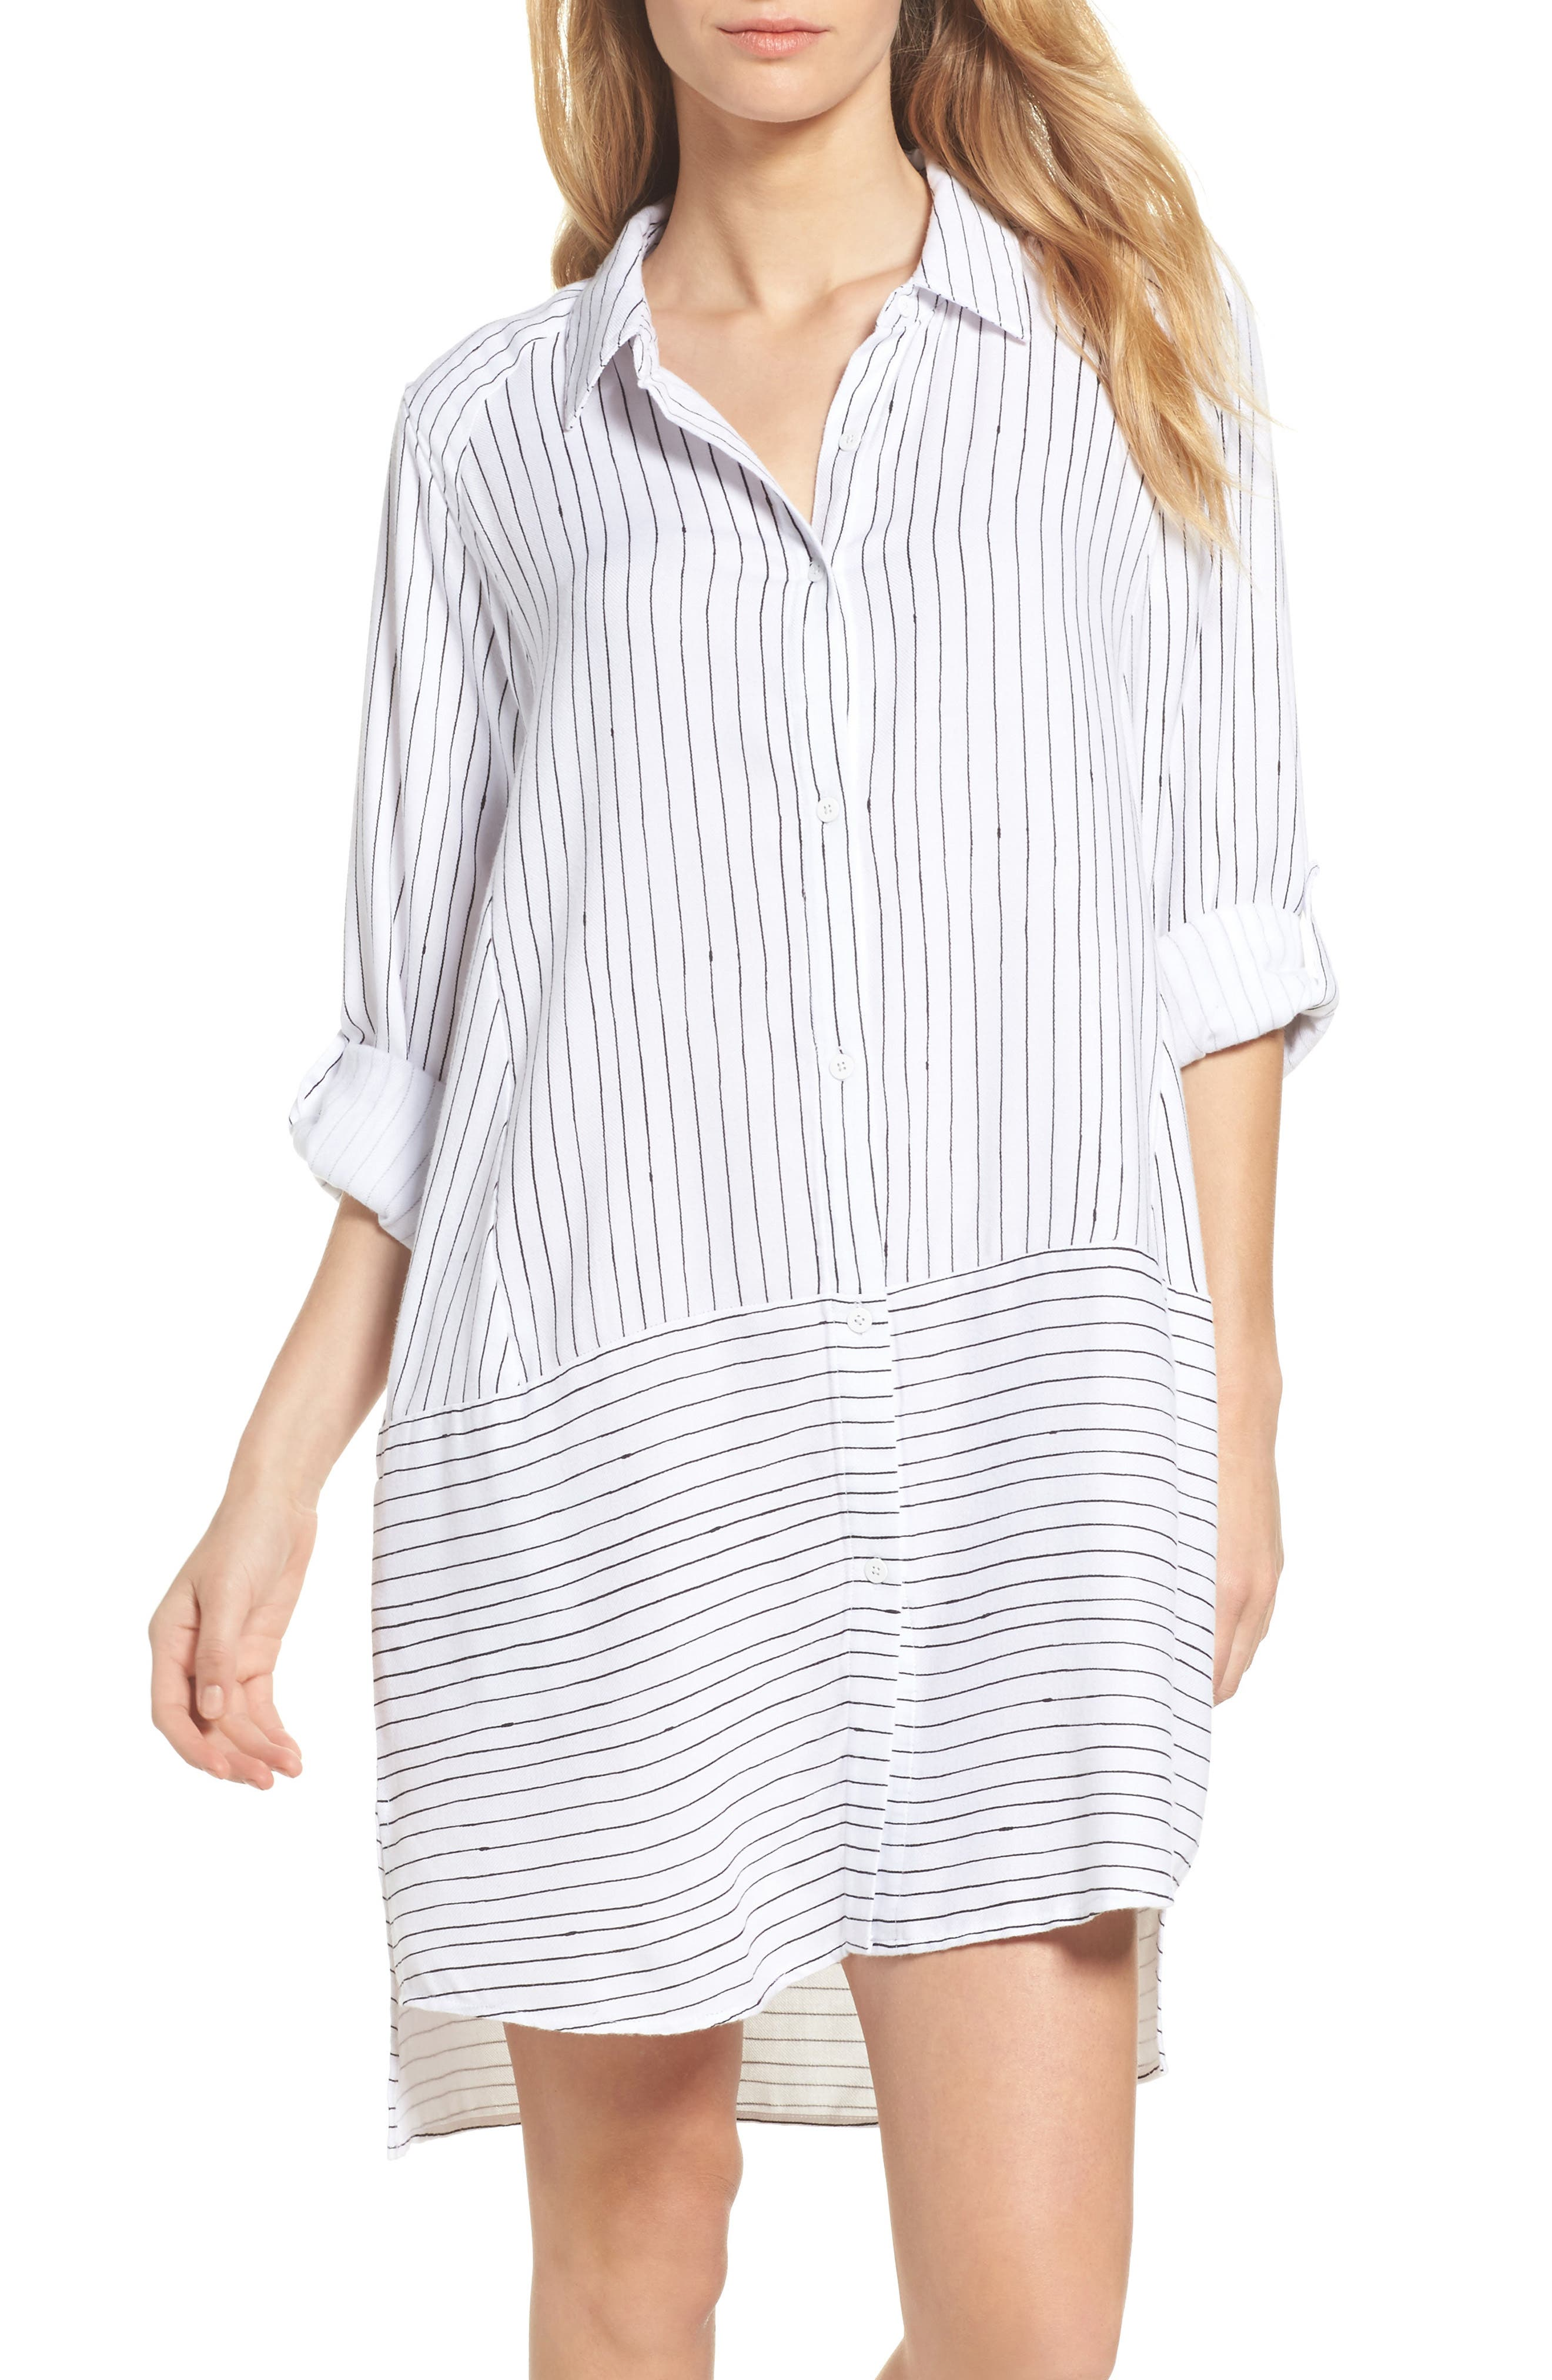 Stripe Sleep Shirt,                             Main thumbnail 1, color,                             White Stripe Print